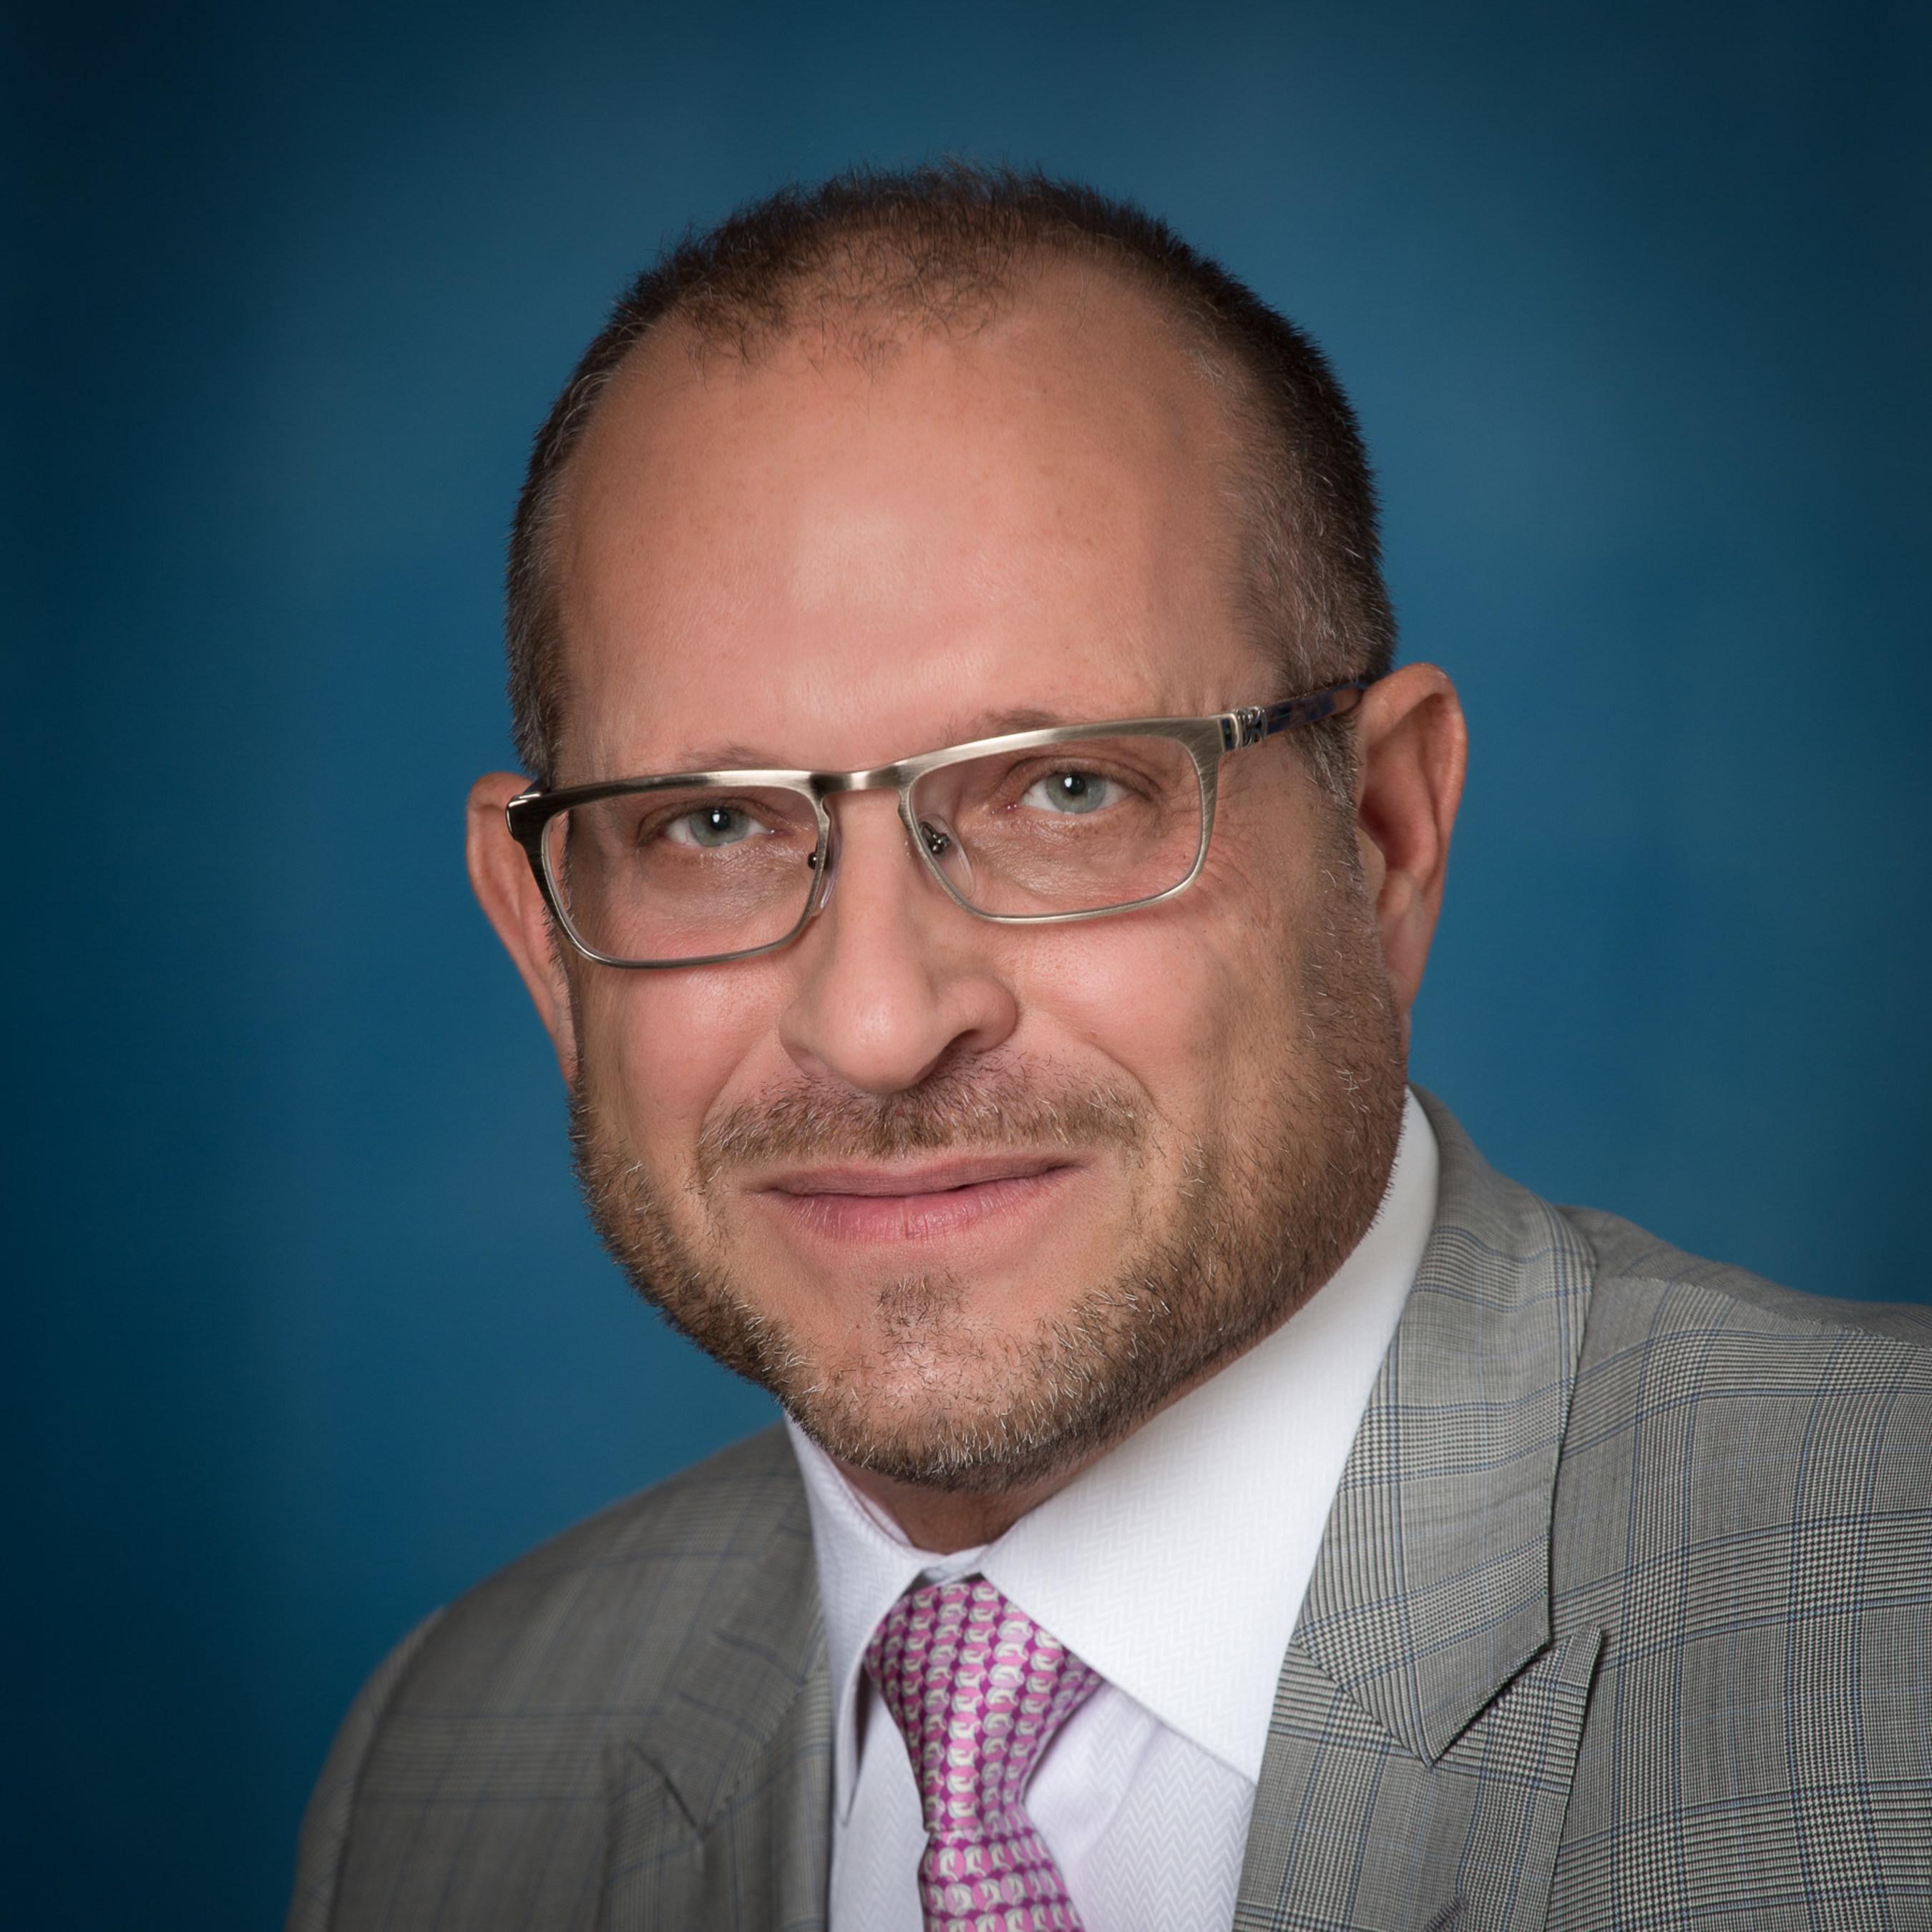 Craig Amato will join V3 Transportation as a senior advisor and investor on Jan. 1, 2016.